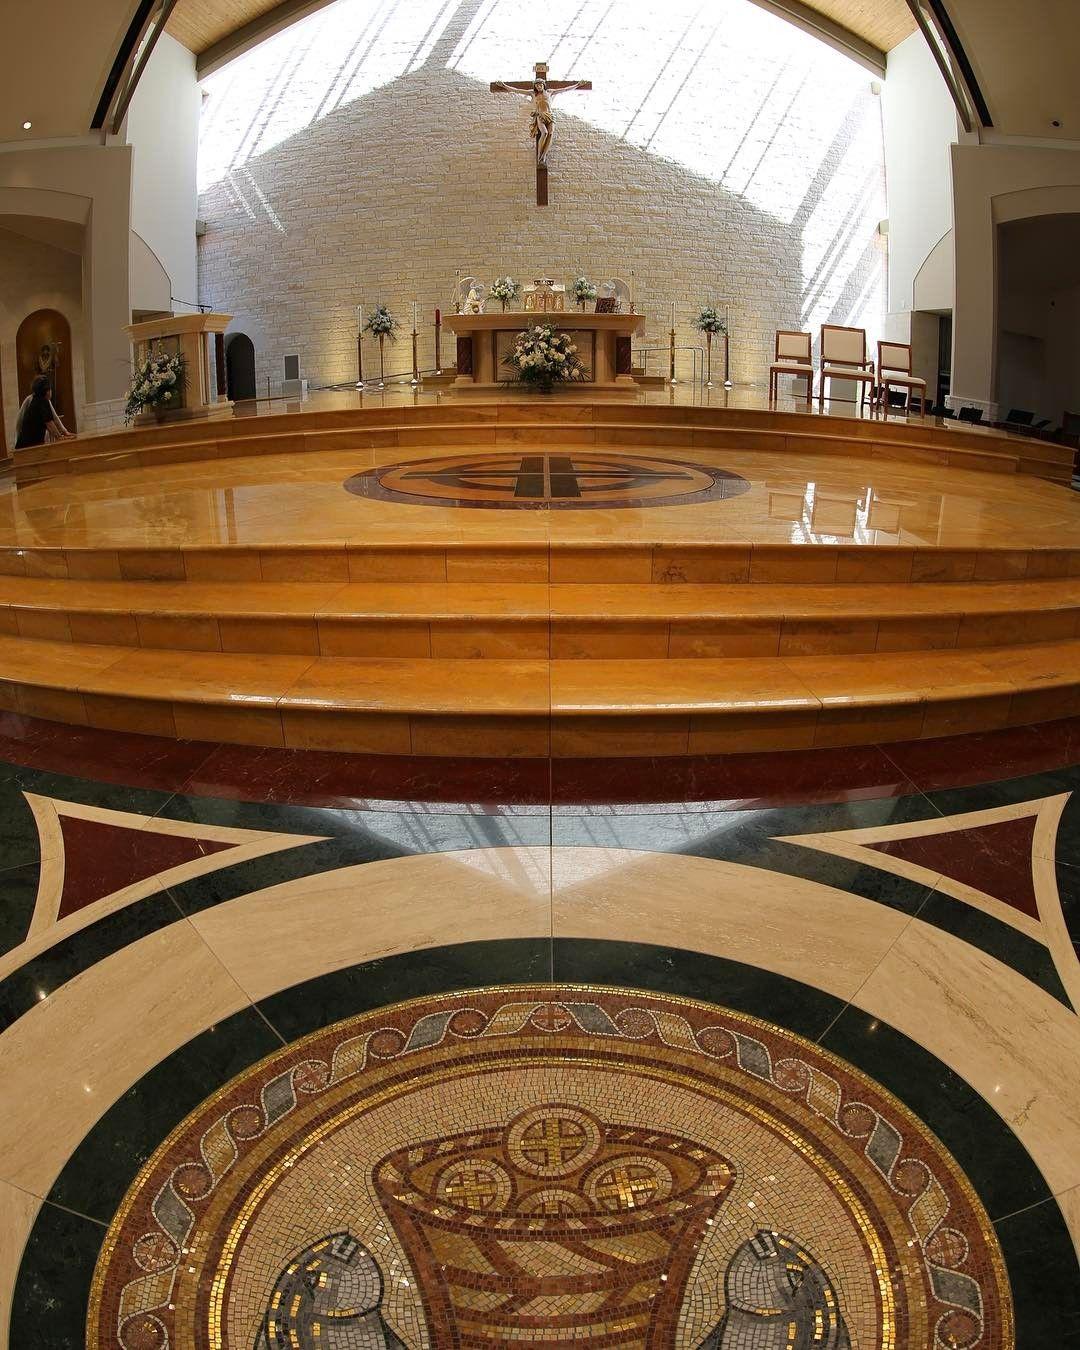 Mosaic Flooring Design St John Vianney Catholic Church Houston Tx Renovation